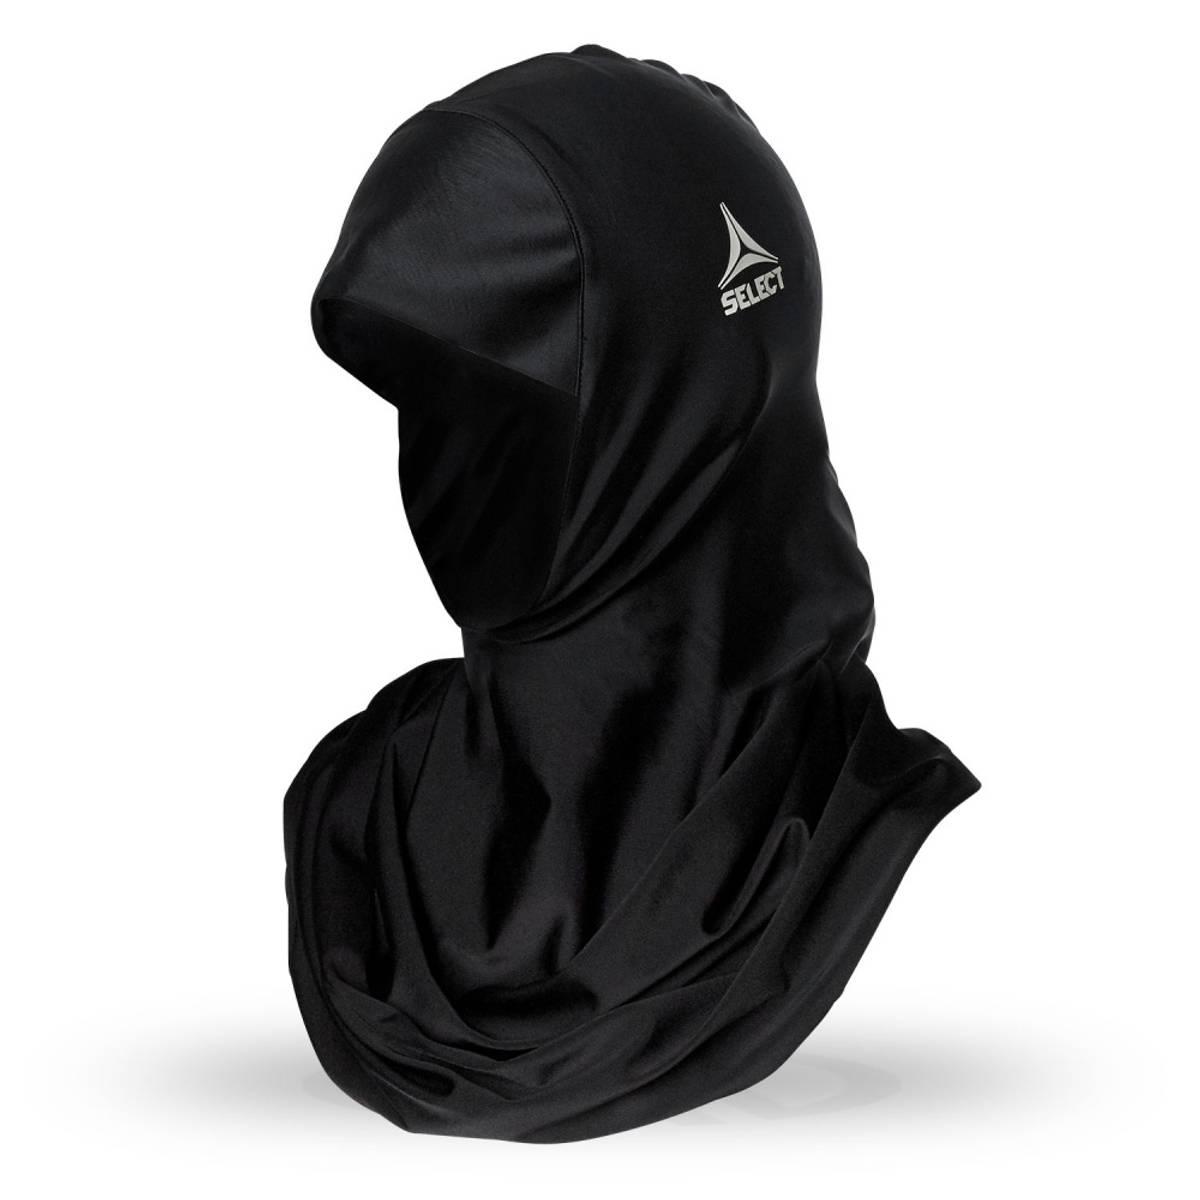 Select Sports Hijab